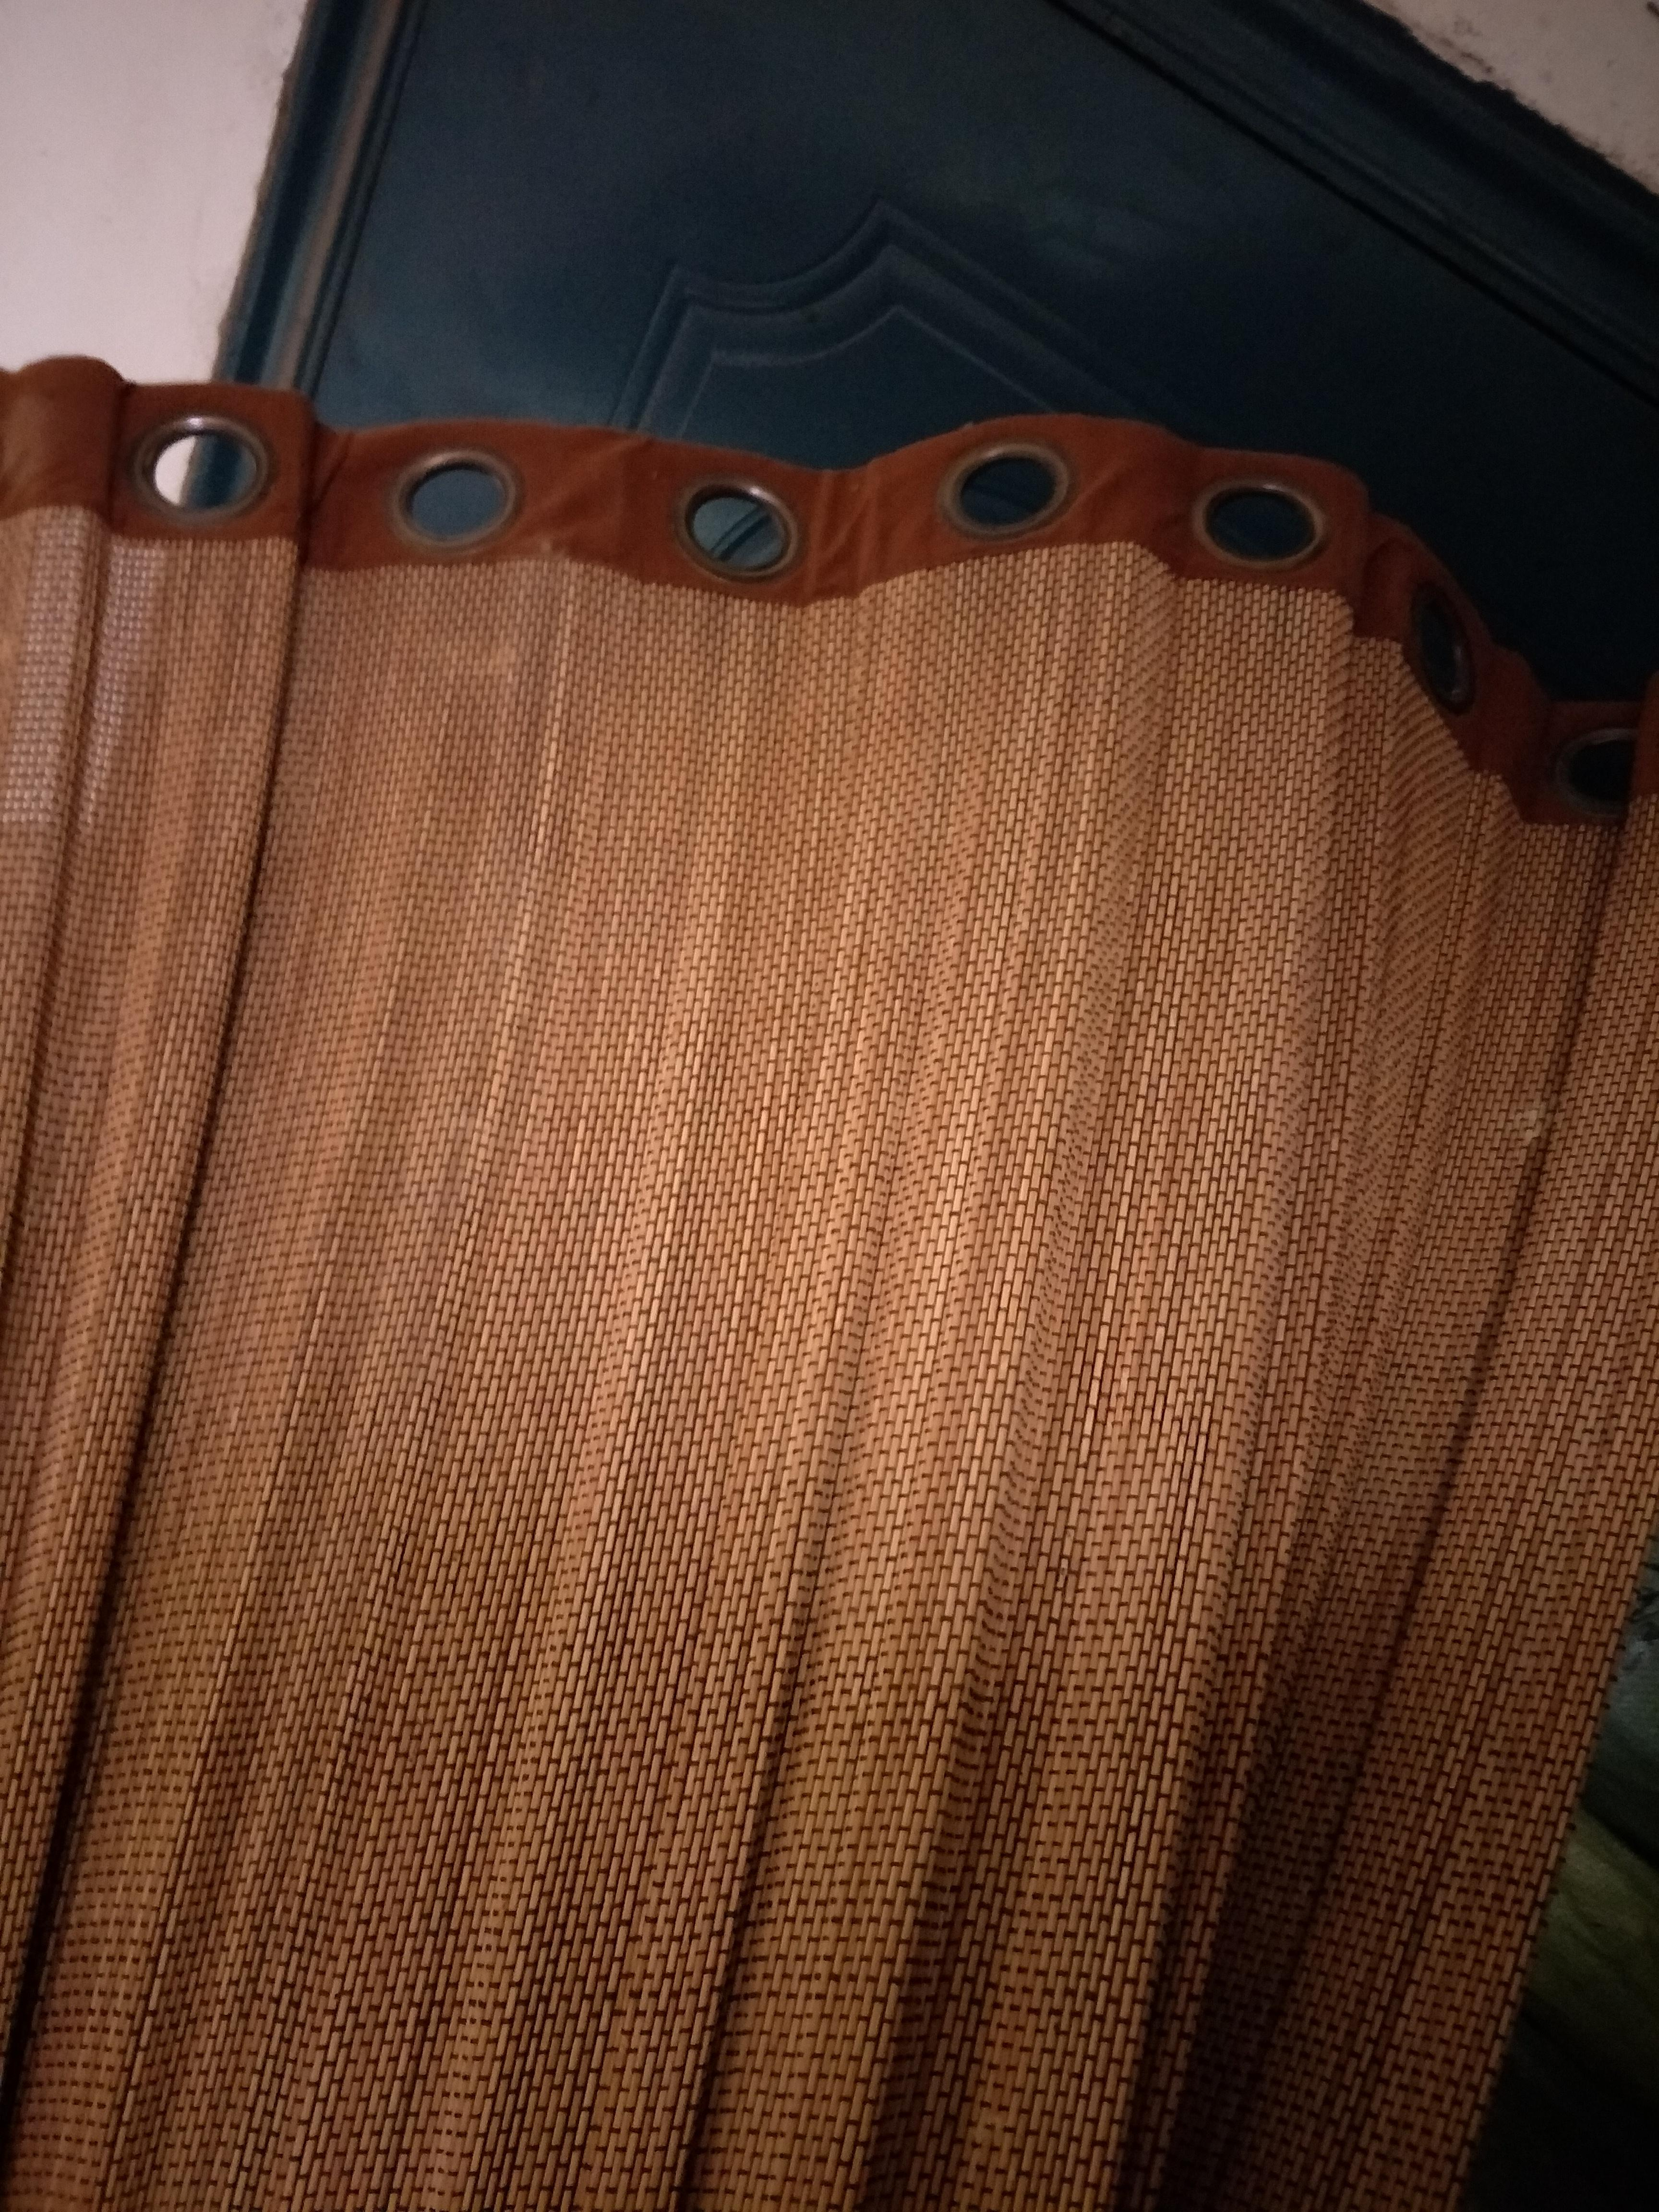 Supply High Grade Bamboo Curtain Bamboo Door Curtain Bamboo Sliding Door Multi Purpose Convenient Installation